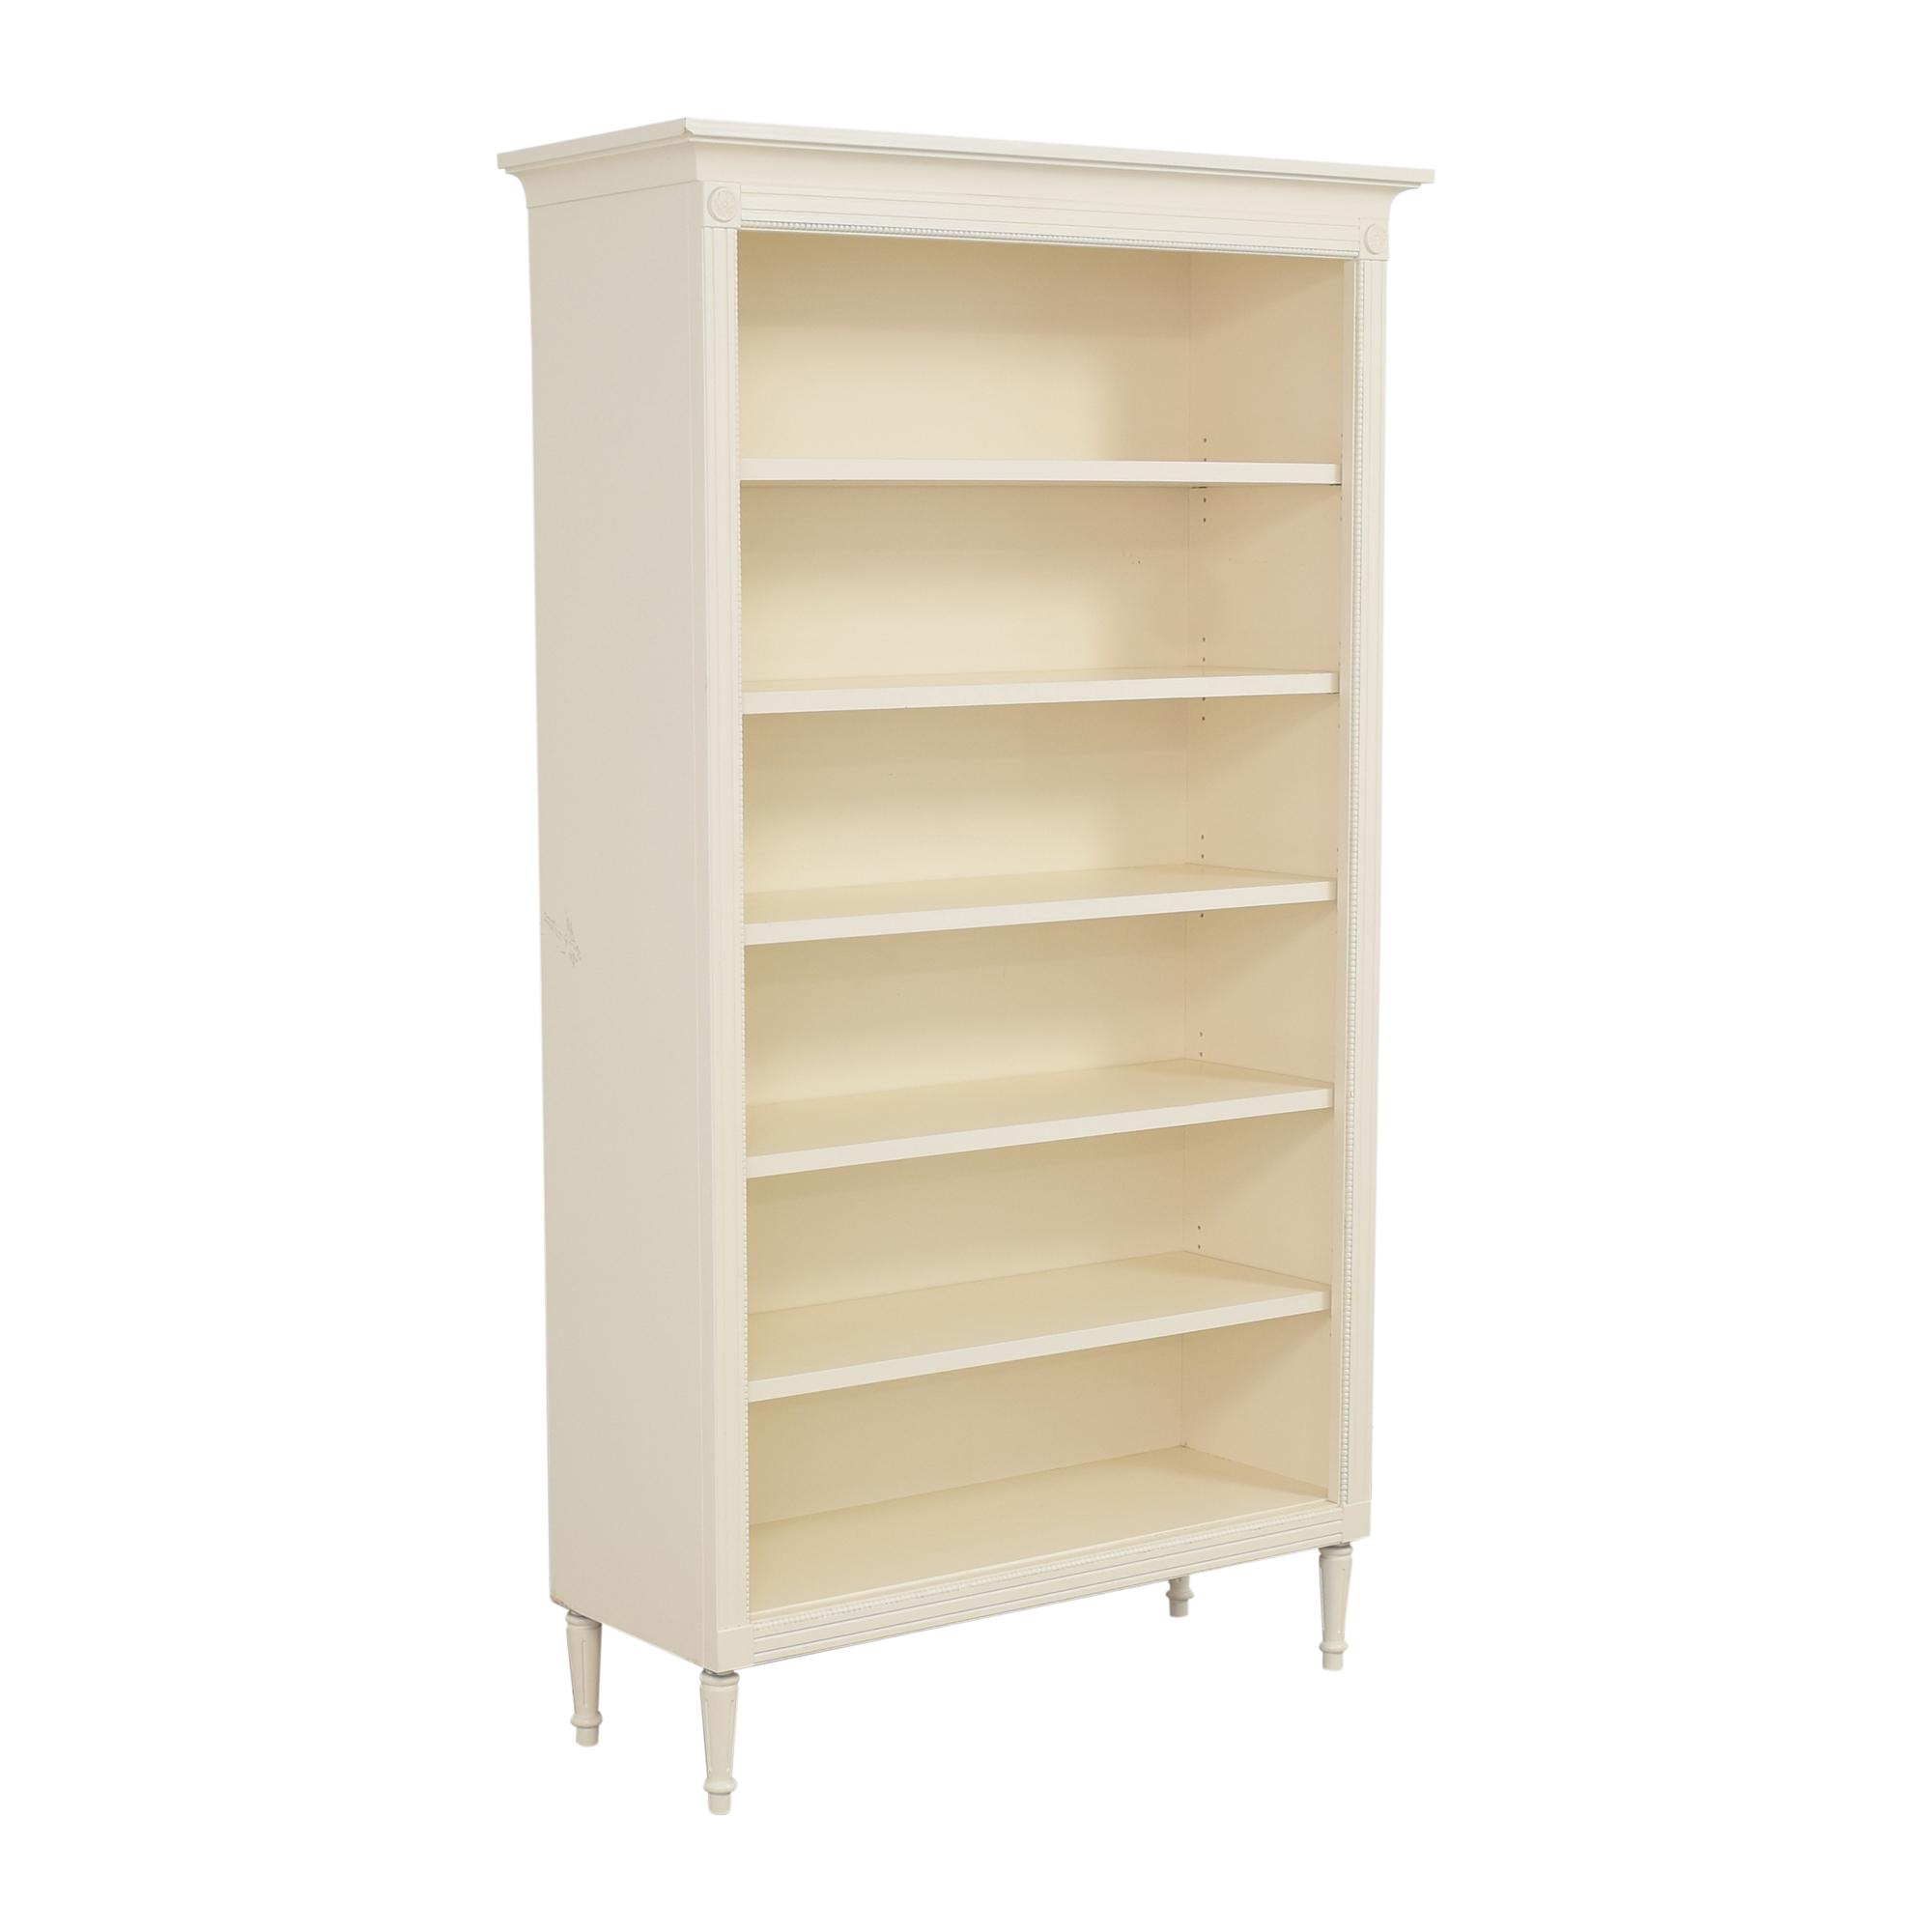 Classic-Style Bookcase